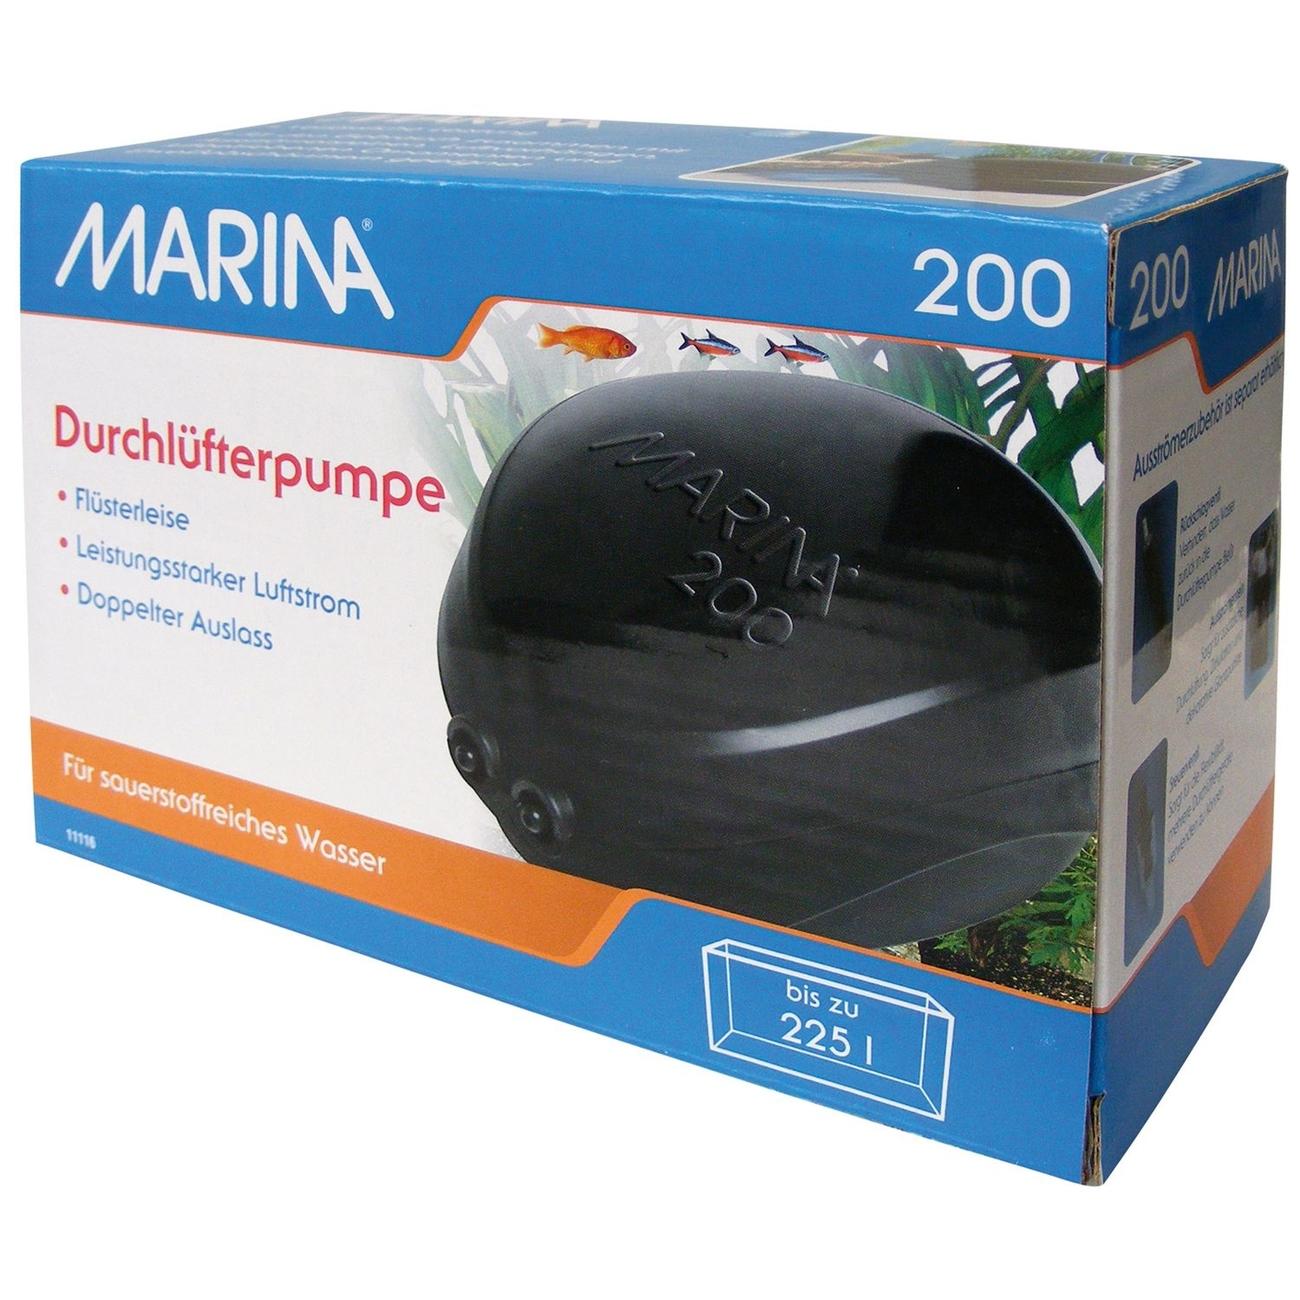 Hagen Marina Durchlüfterpumpe, 200 (9,4 x 6,9 x 12,9 cm)